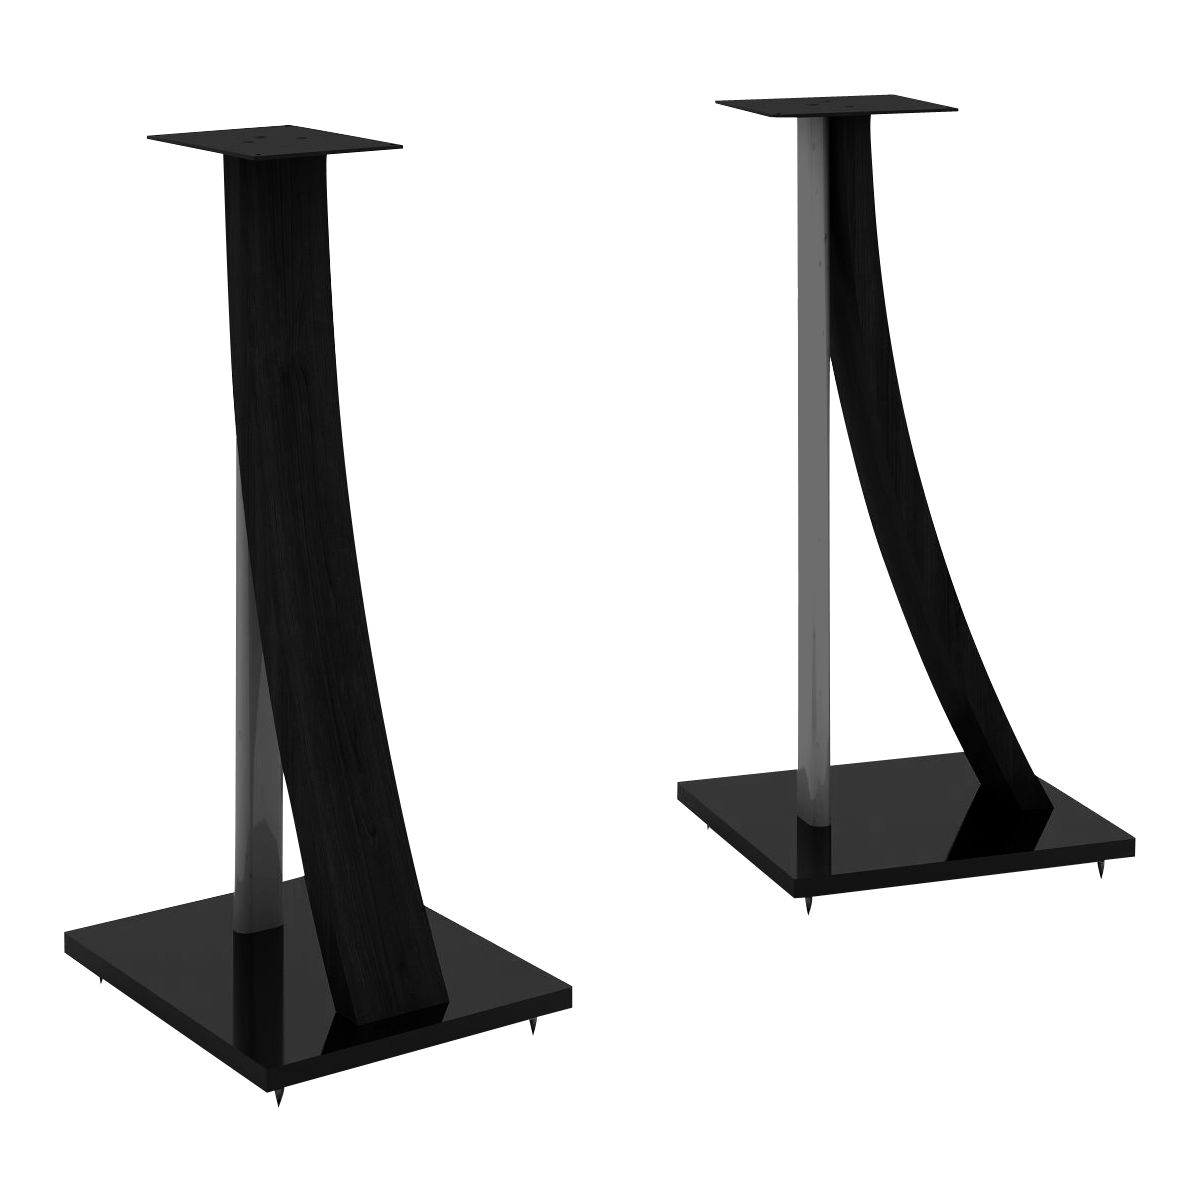 support et pied d 39 enceinte home cin ma page 2 comparer les prix. Black Bedroom Furniture Sets. Home Design Ideas